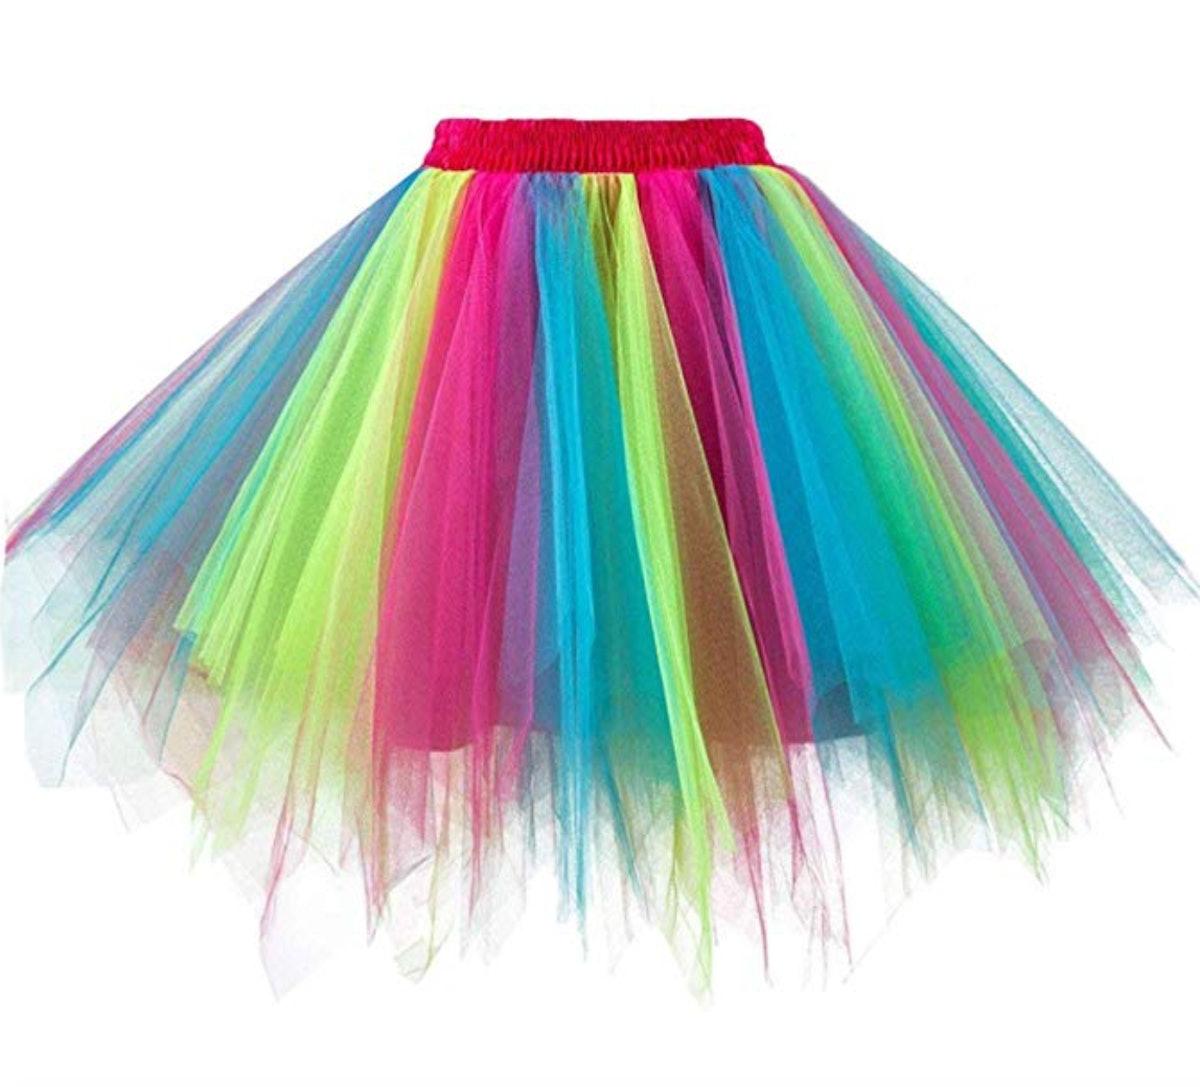 Girstunm Bubble Tutu Dance Half Slip Skirt